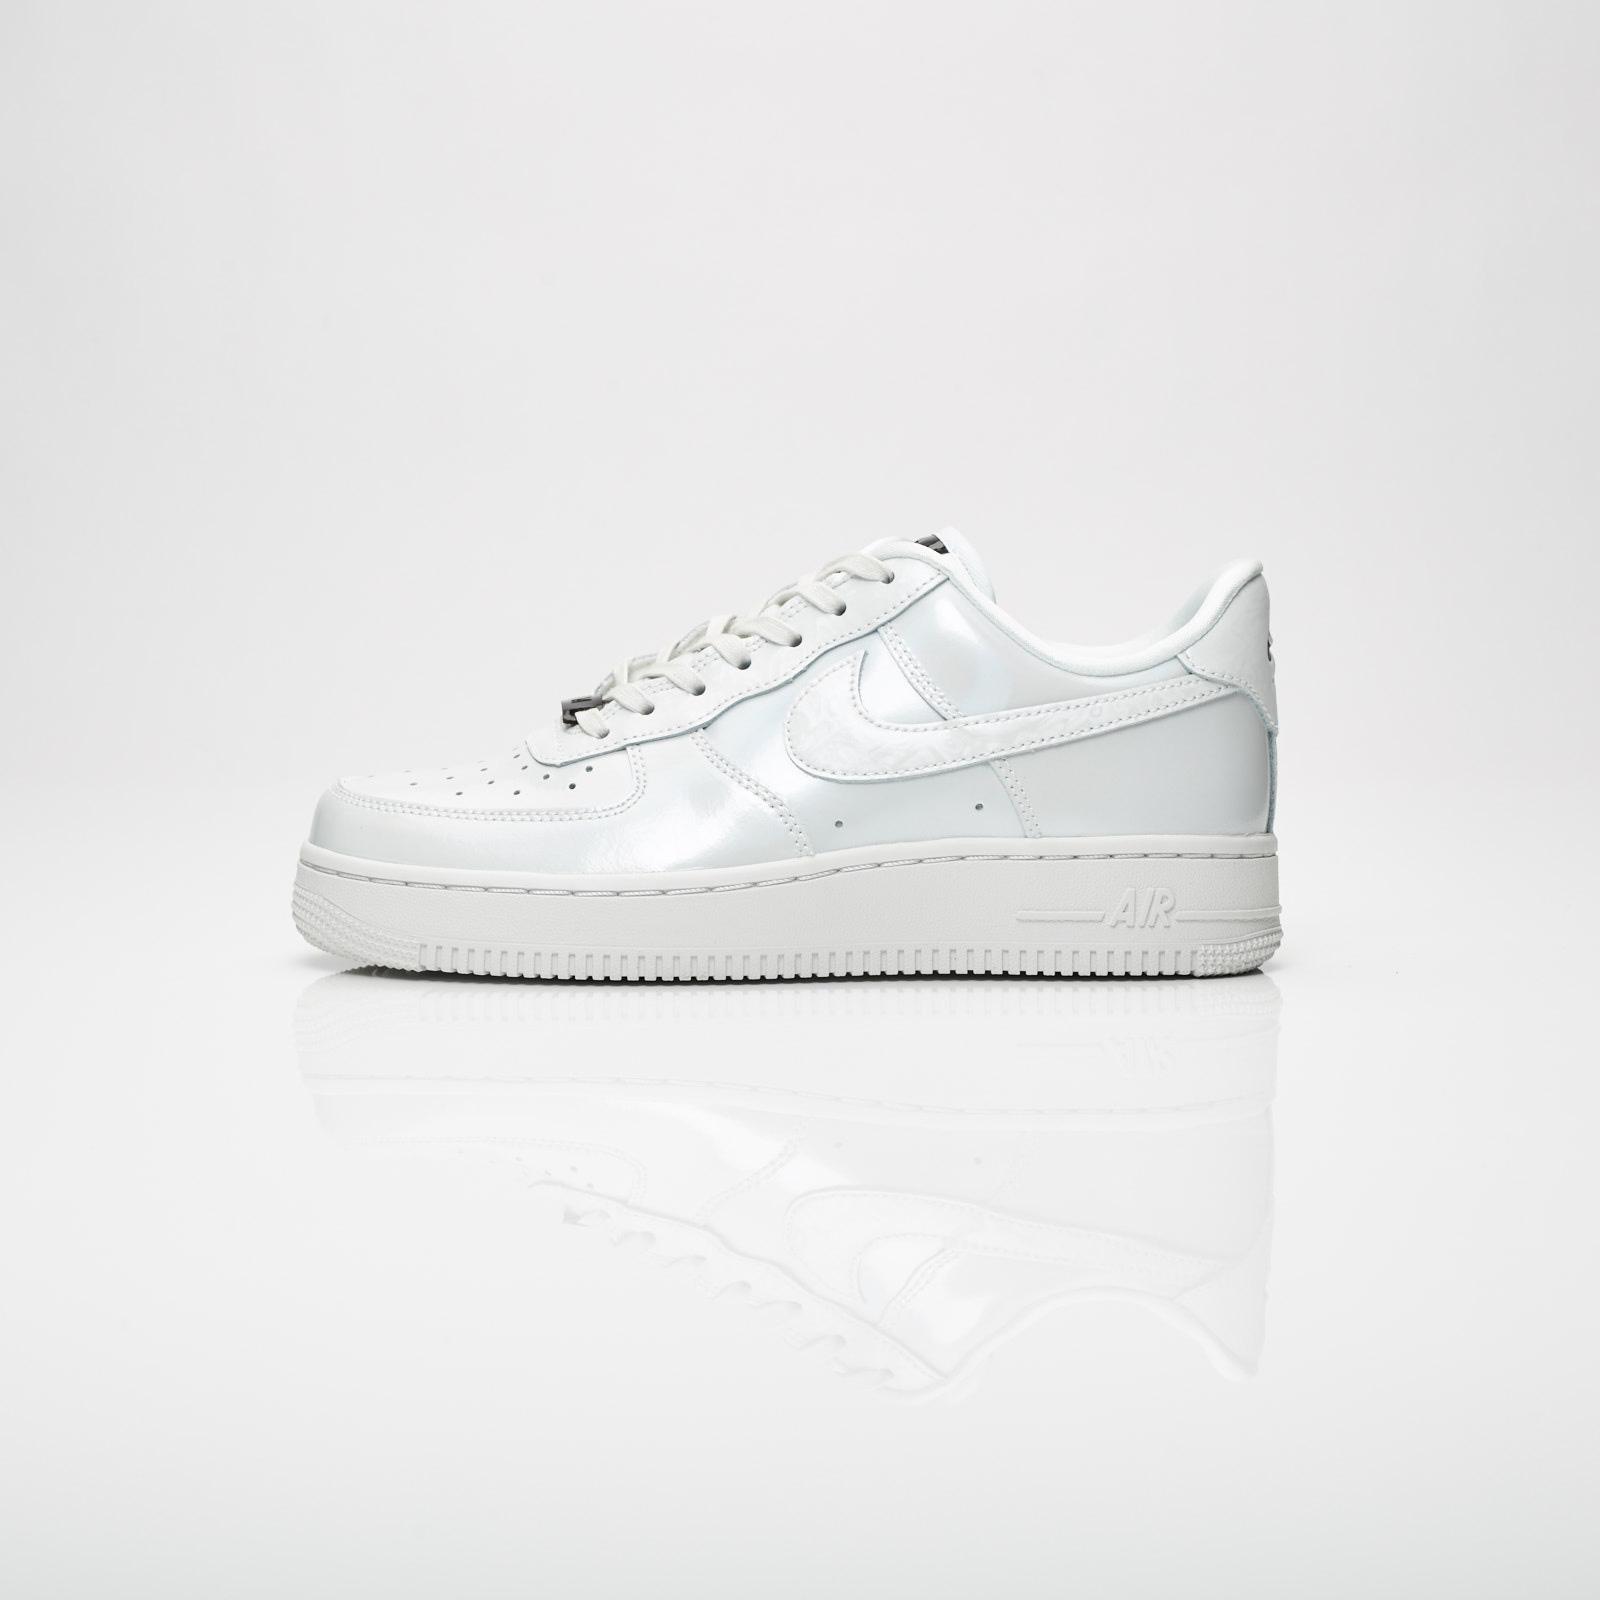 Nike Wmns Air Force 1 07 LX 898889 100 Sneakersnstuff